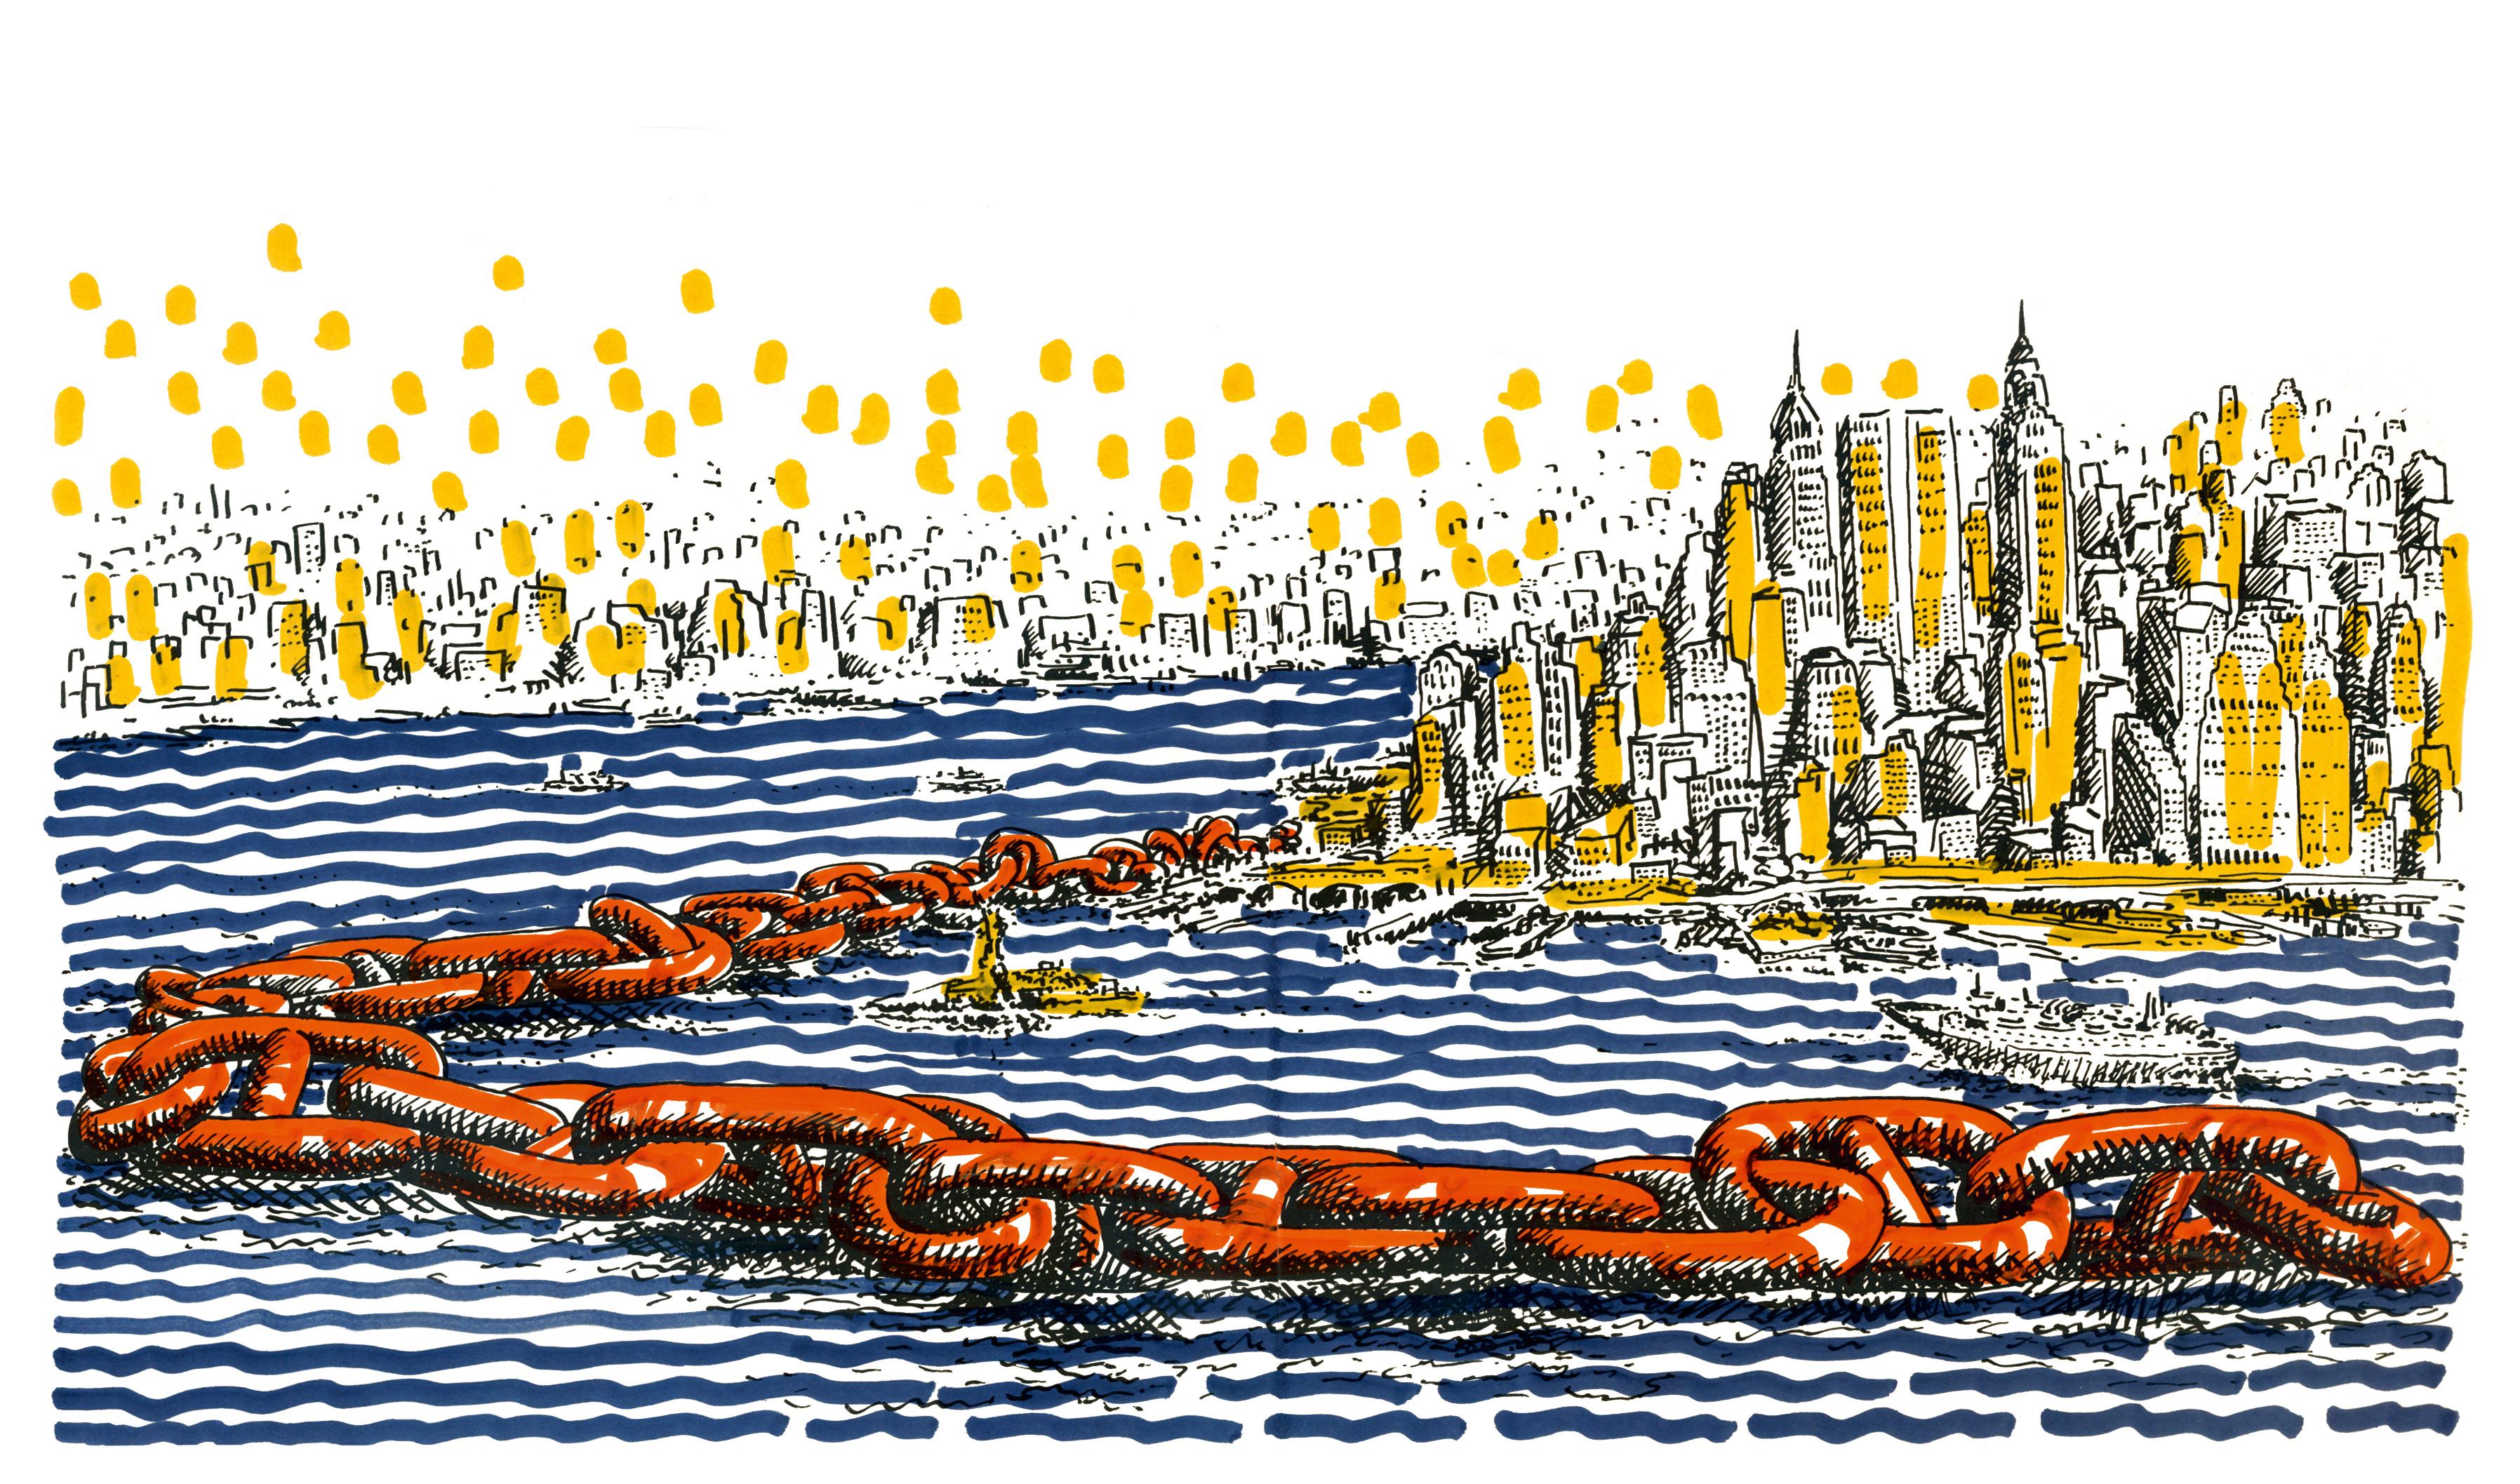 Peter Travaglini, New York Mappe, 1970-72, Serigraphie auf Papier, koloriert, Copyright: Nachlass Travaglini